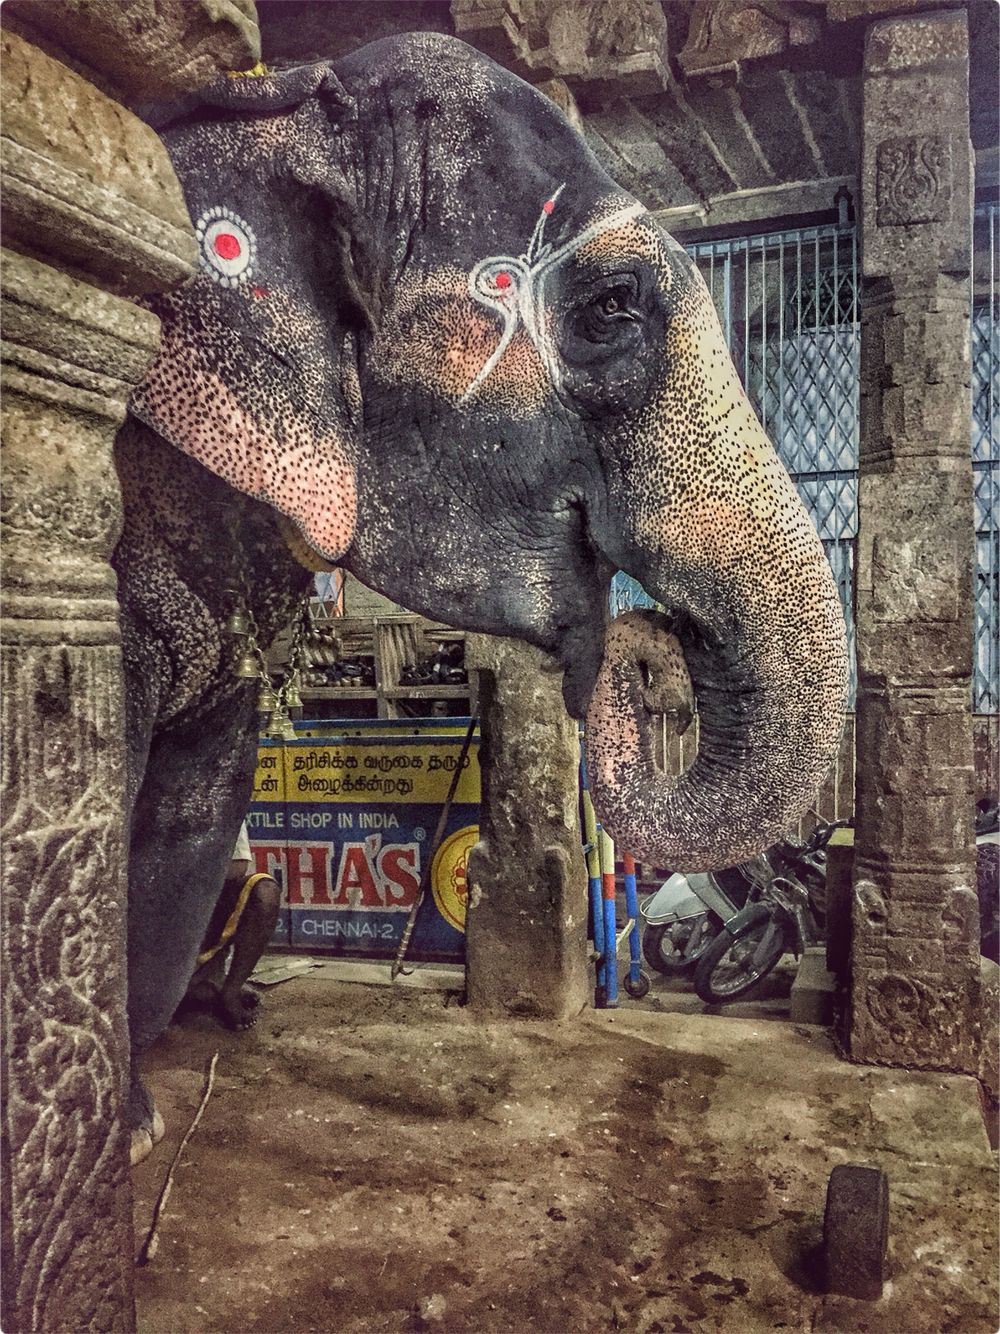 Majestic! Elephants #sounthindia #tamilnadu #incredibleindia #trichy #trichirapalli #templetown